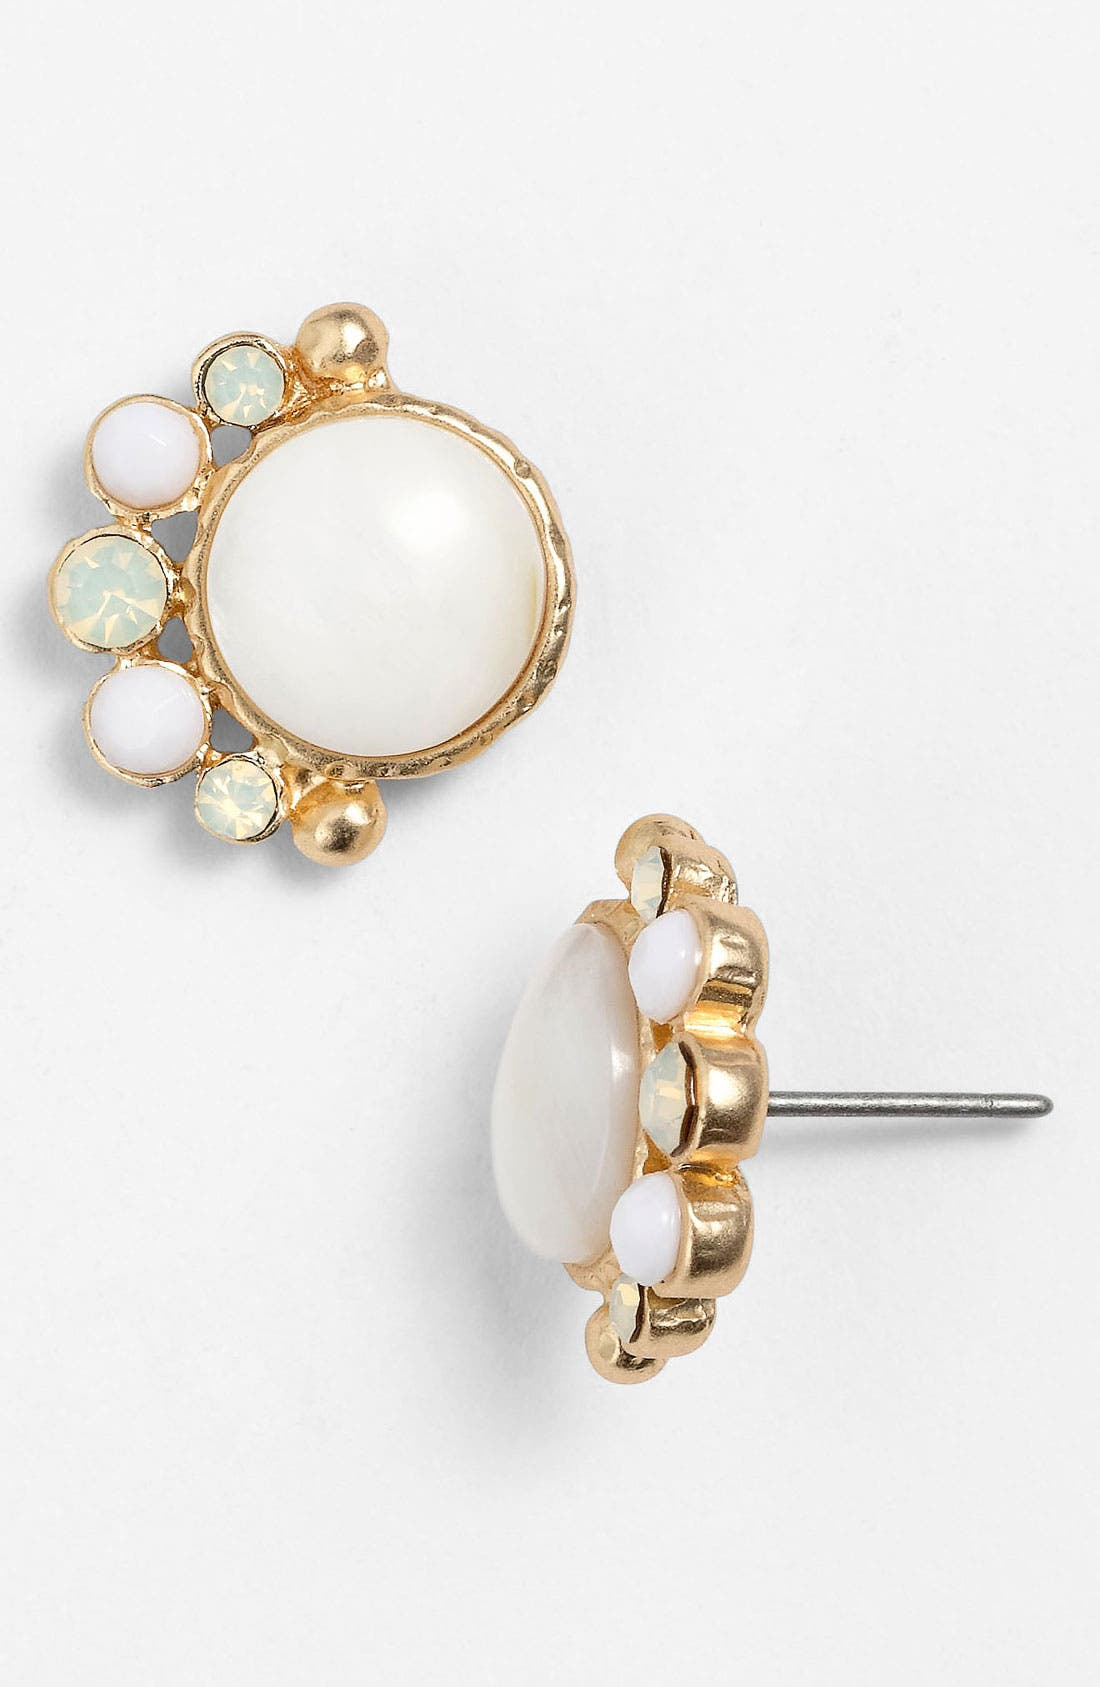 Main Image - Nordstrom 'Santorini' Small Stud Earrings